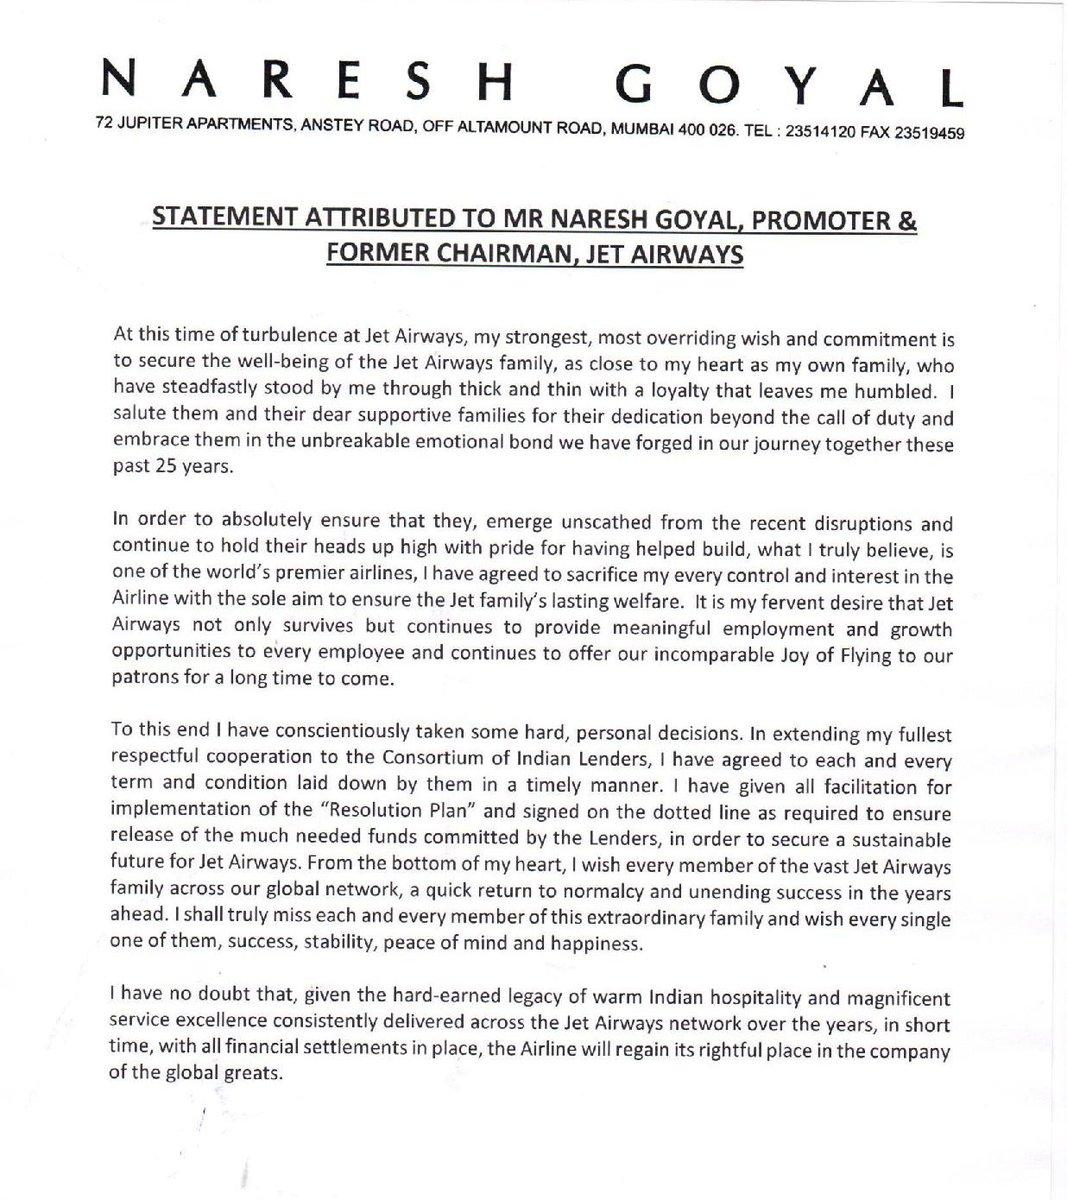 Statement by Mr. Naresh Goyal. https://t.co/v61nqg8qlZ